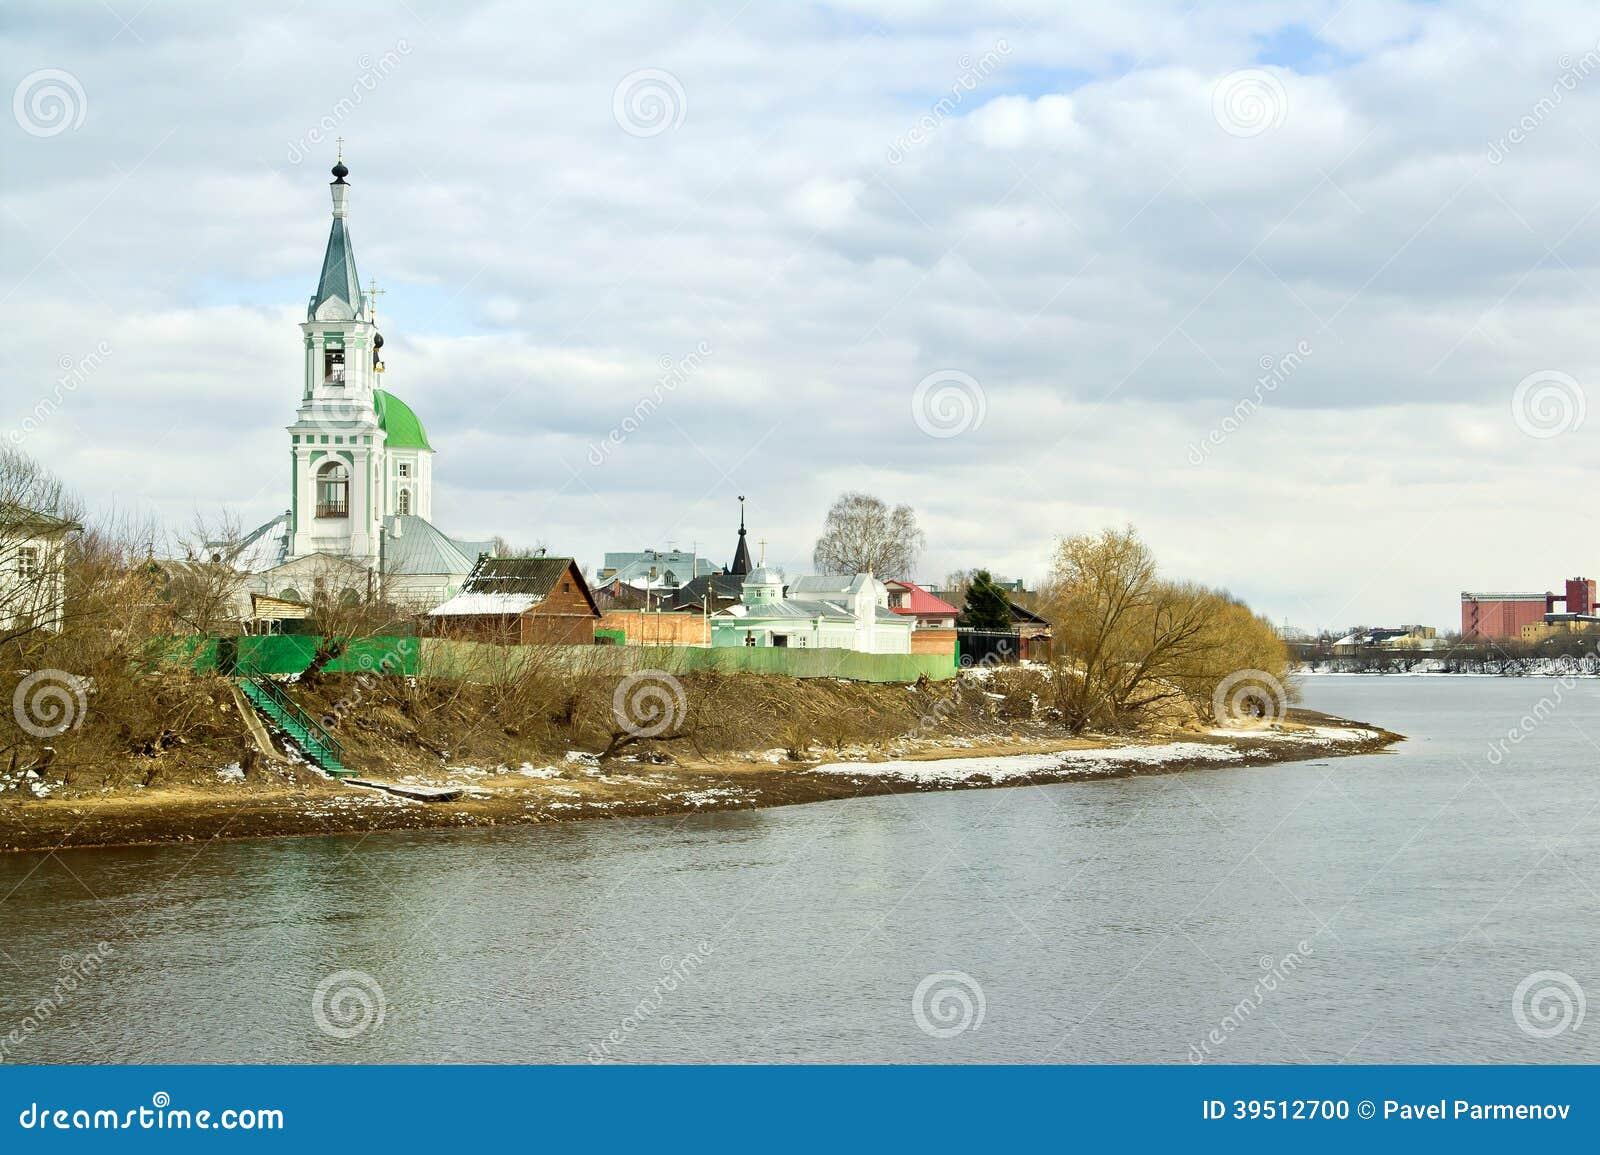 Tver. Catherine-Nonnenkloster. Kirche von Catherine